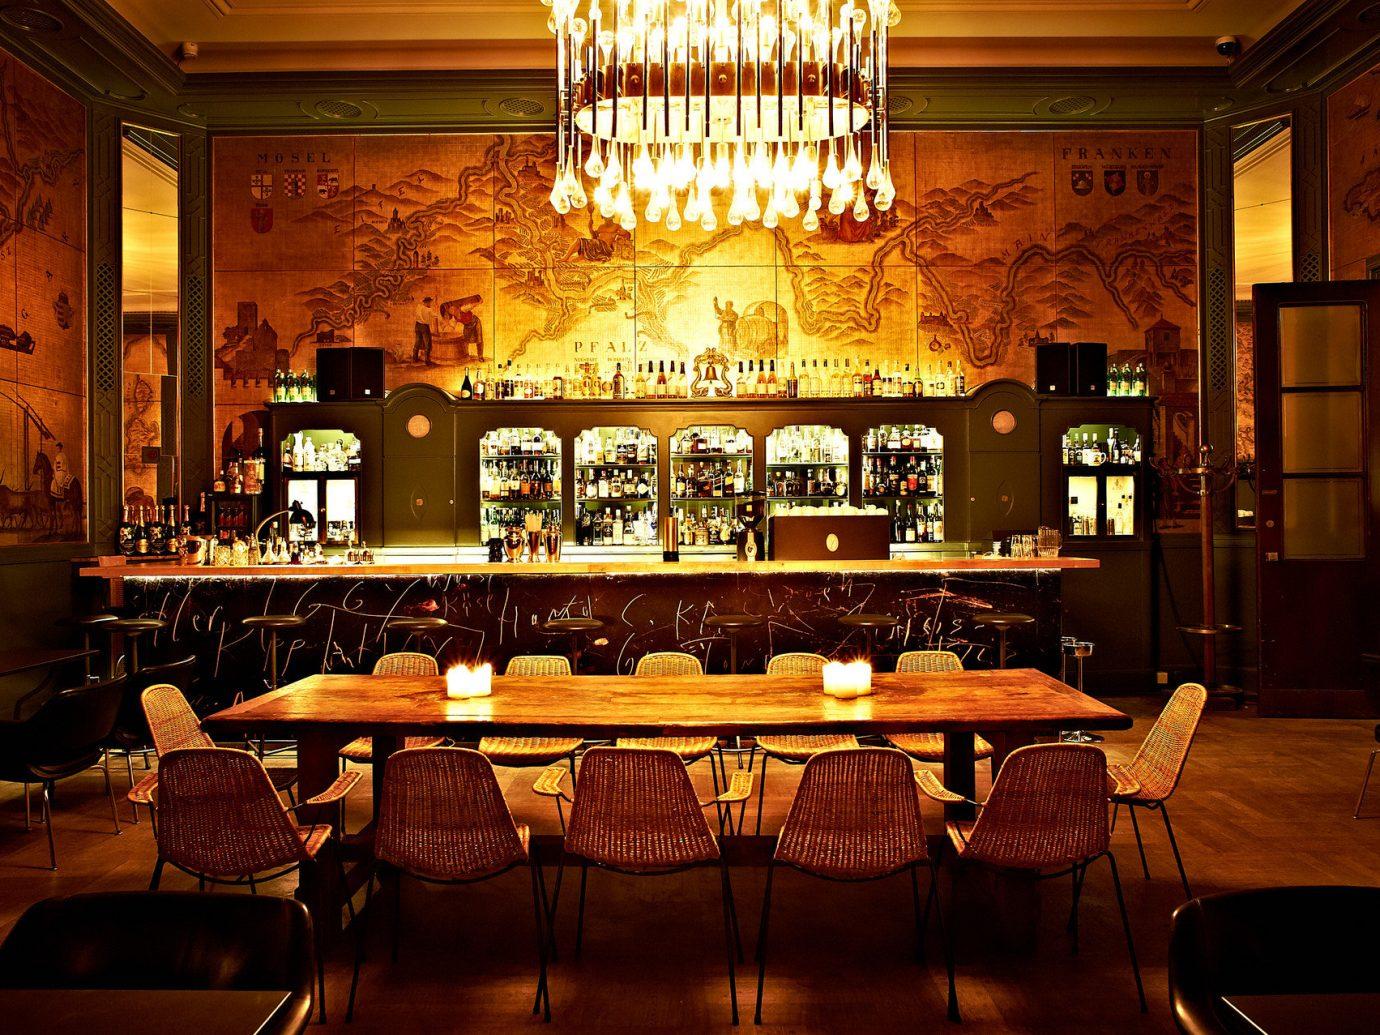 ambient lighting artistic artsy Bar bar seating charming cozy dark dim Hip homey interior trendy Trip Ideas warm yellow indoor floor ceiling restaurant meal dining room